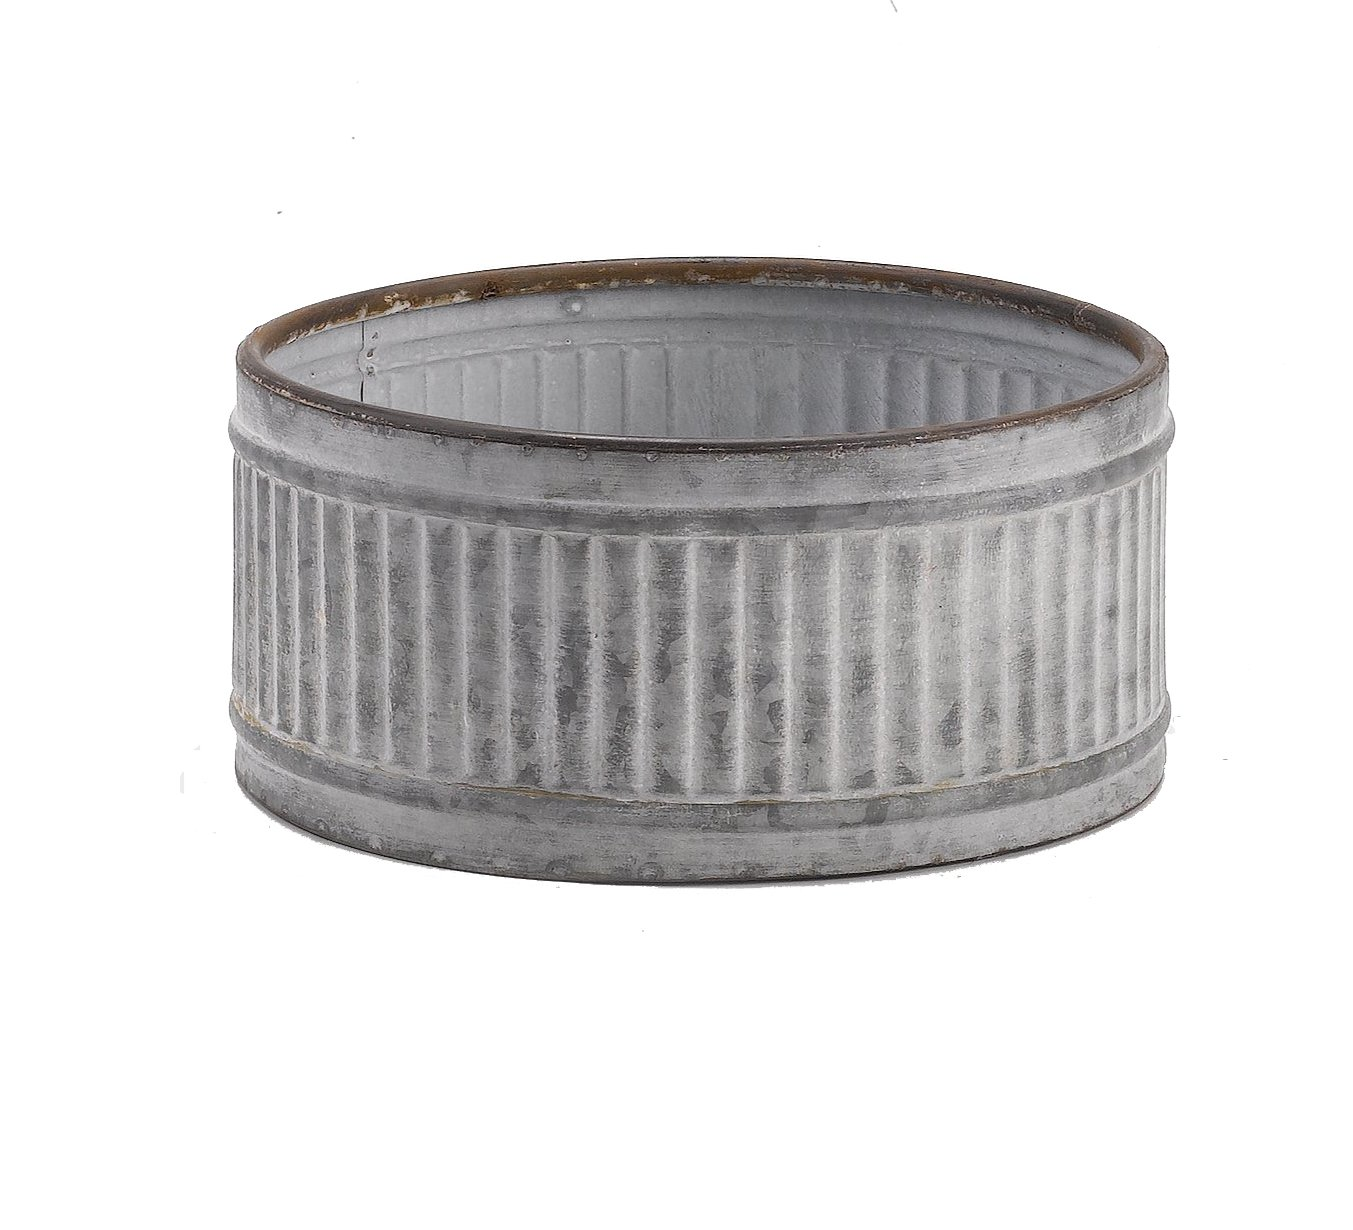 5.75 x 12.25 Round Metal Planter